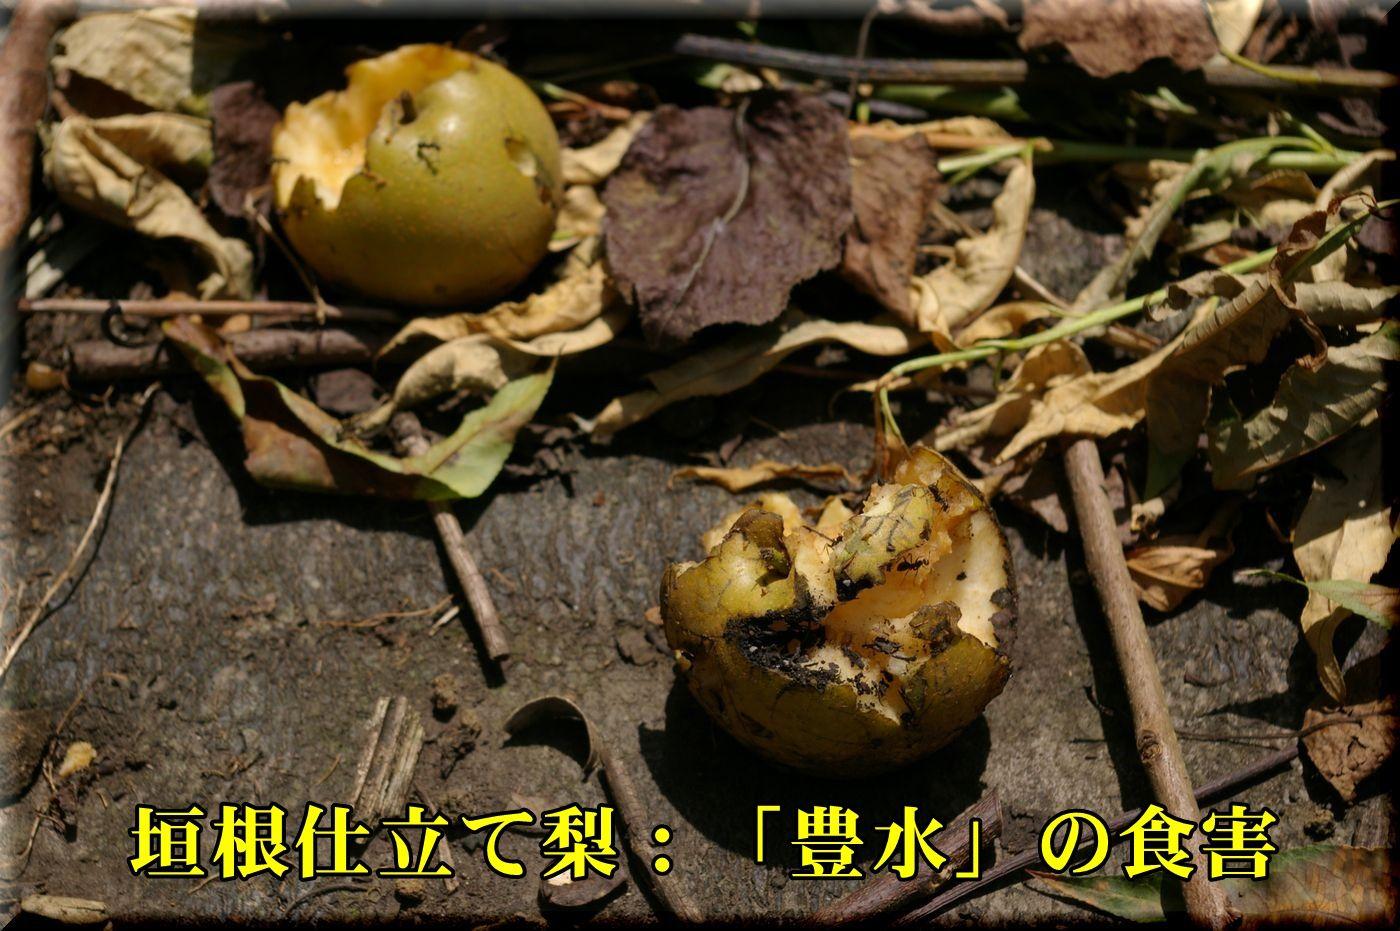 1housui160723.jpg